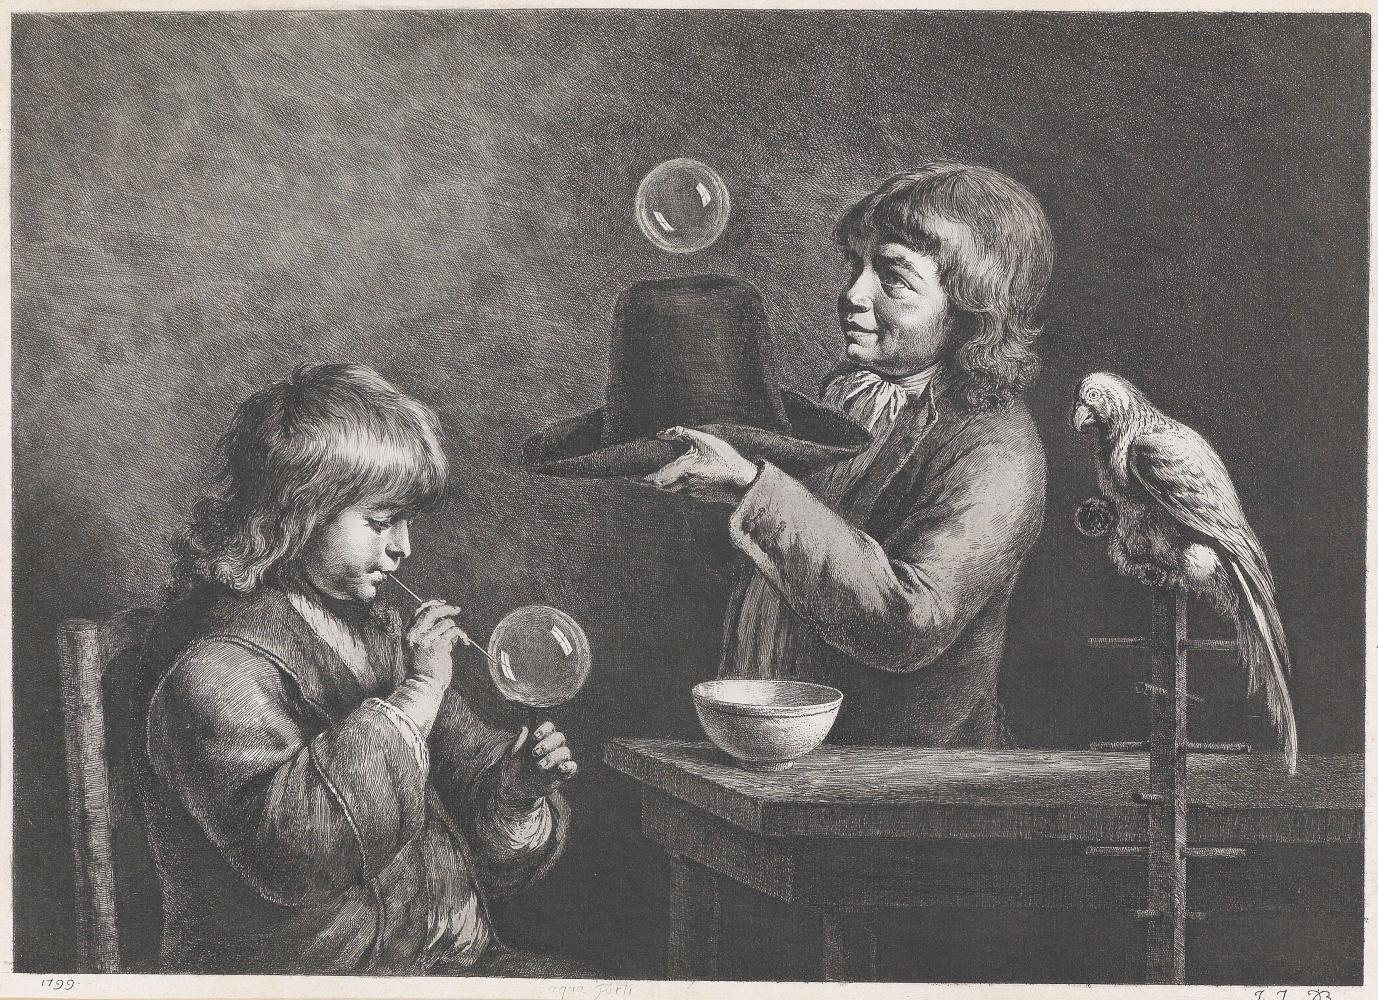 """Французский Рембрант"" в Германии: Жан-Жак де Буассьё во Франкфурте-на-Майне"